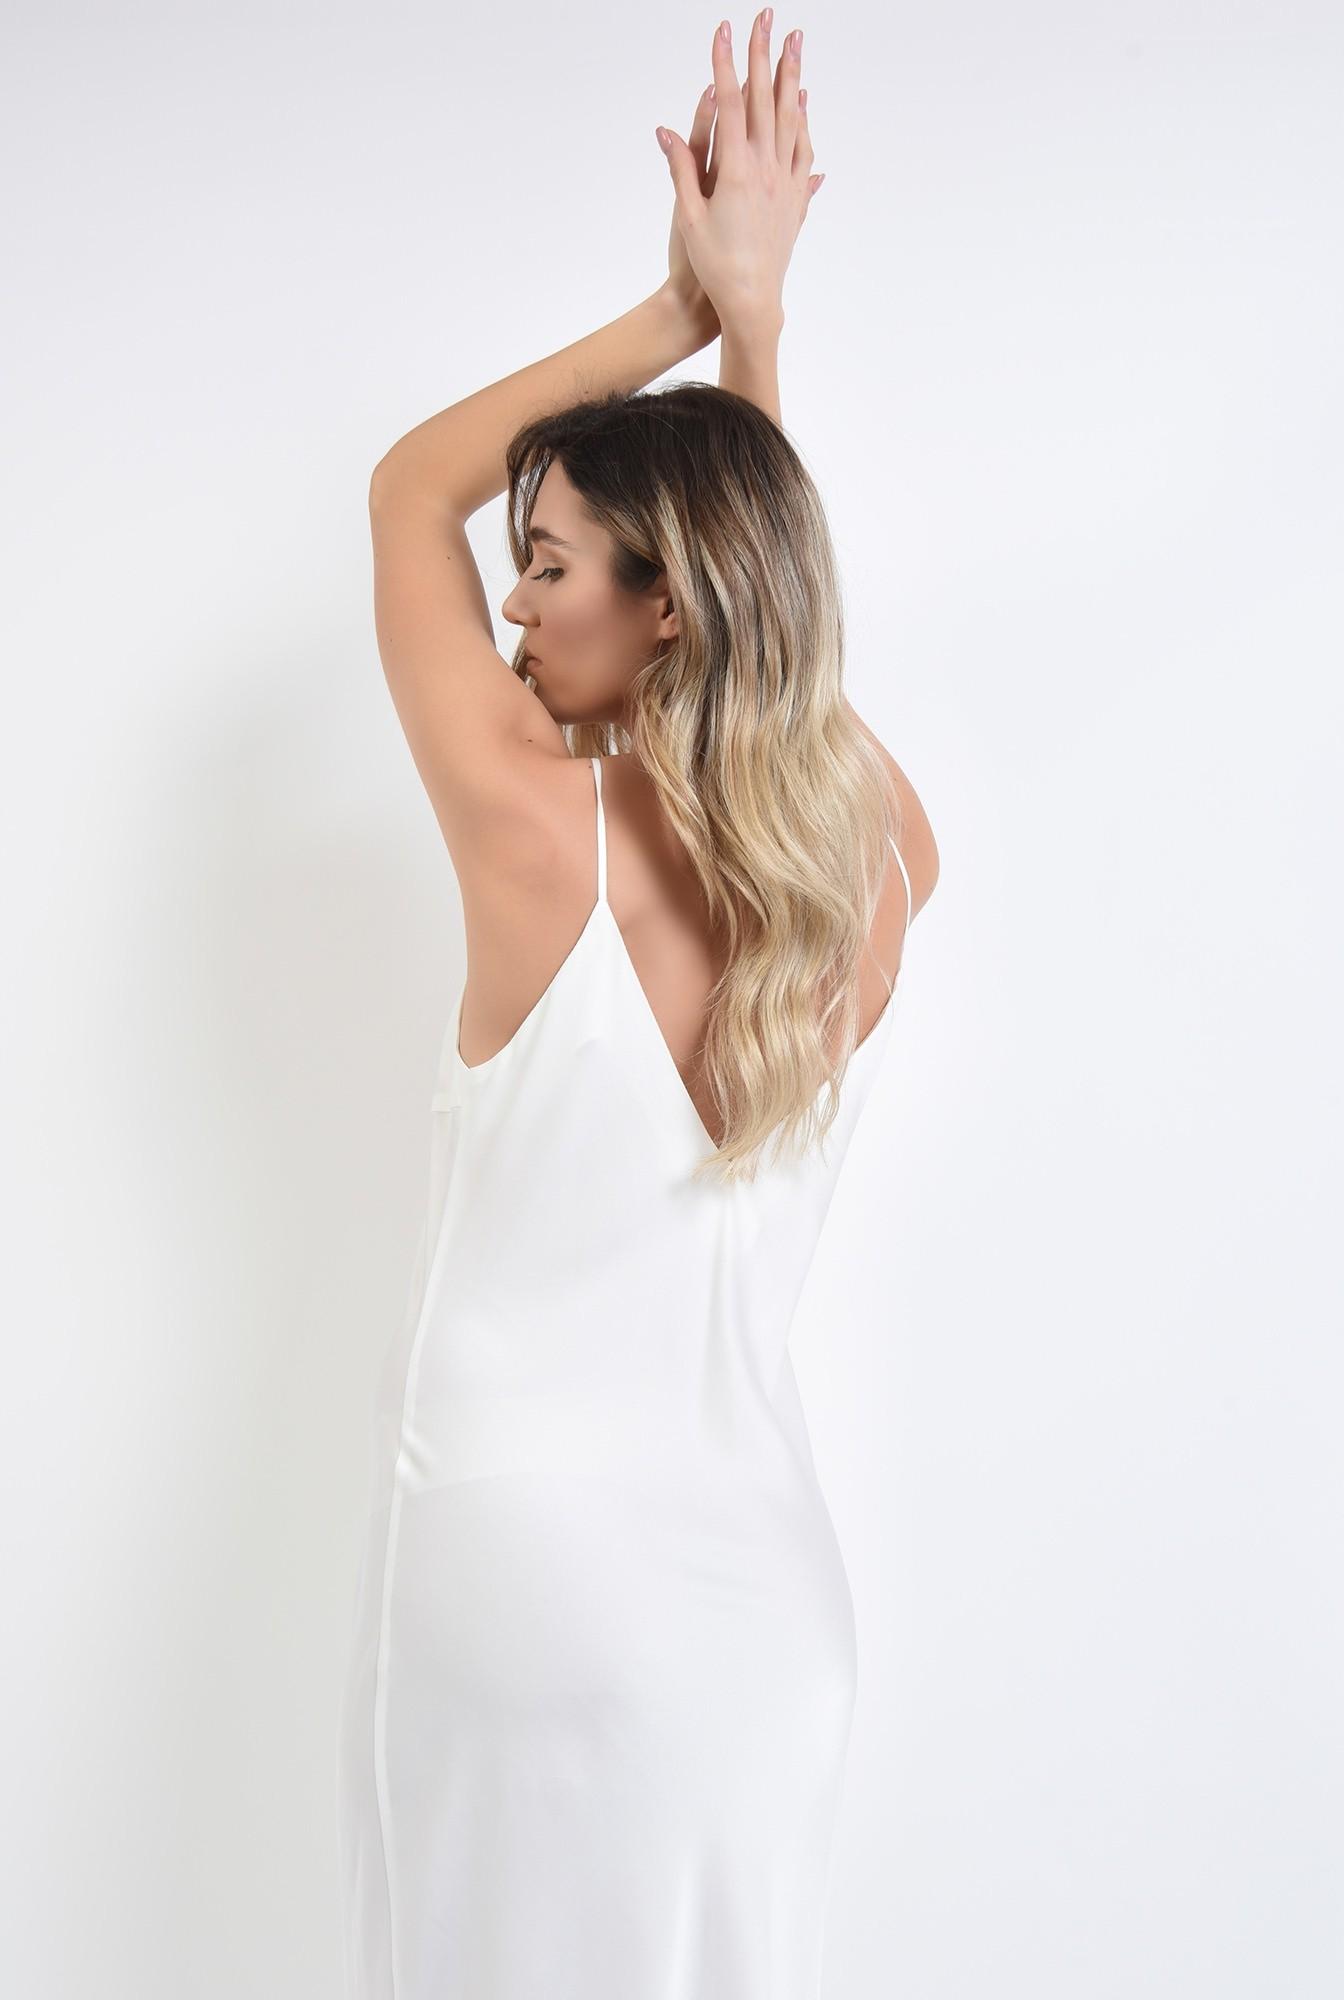 2 - rochie alba, din satin, cu bretele subtiri